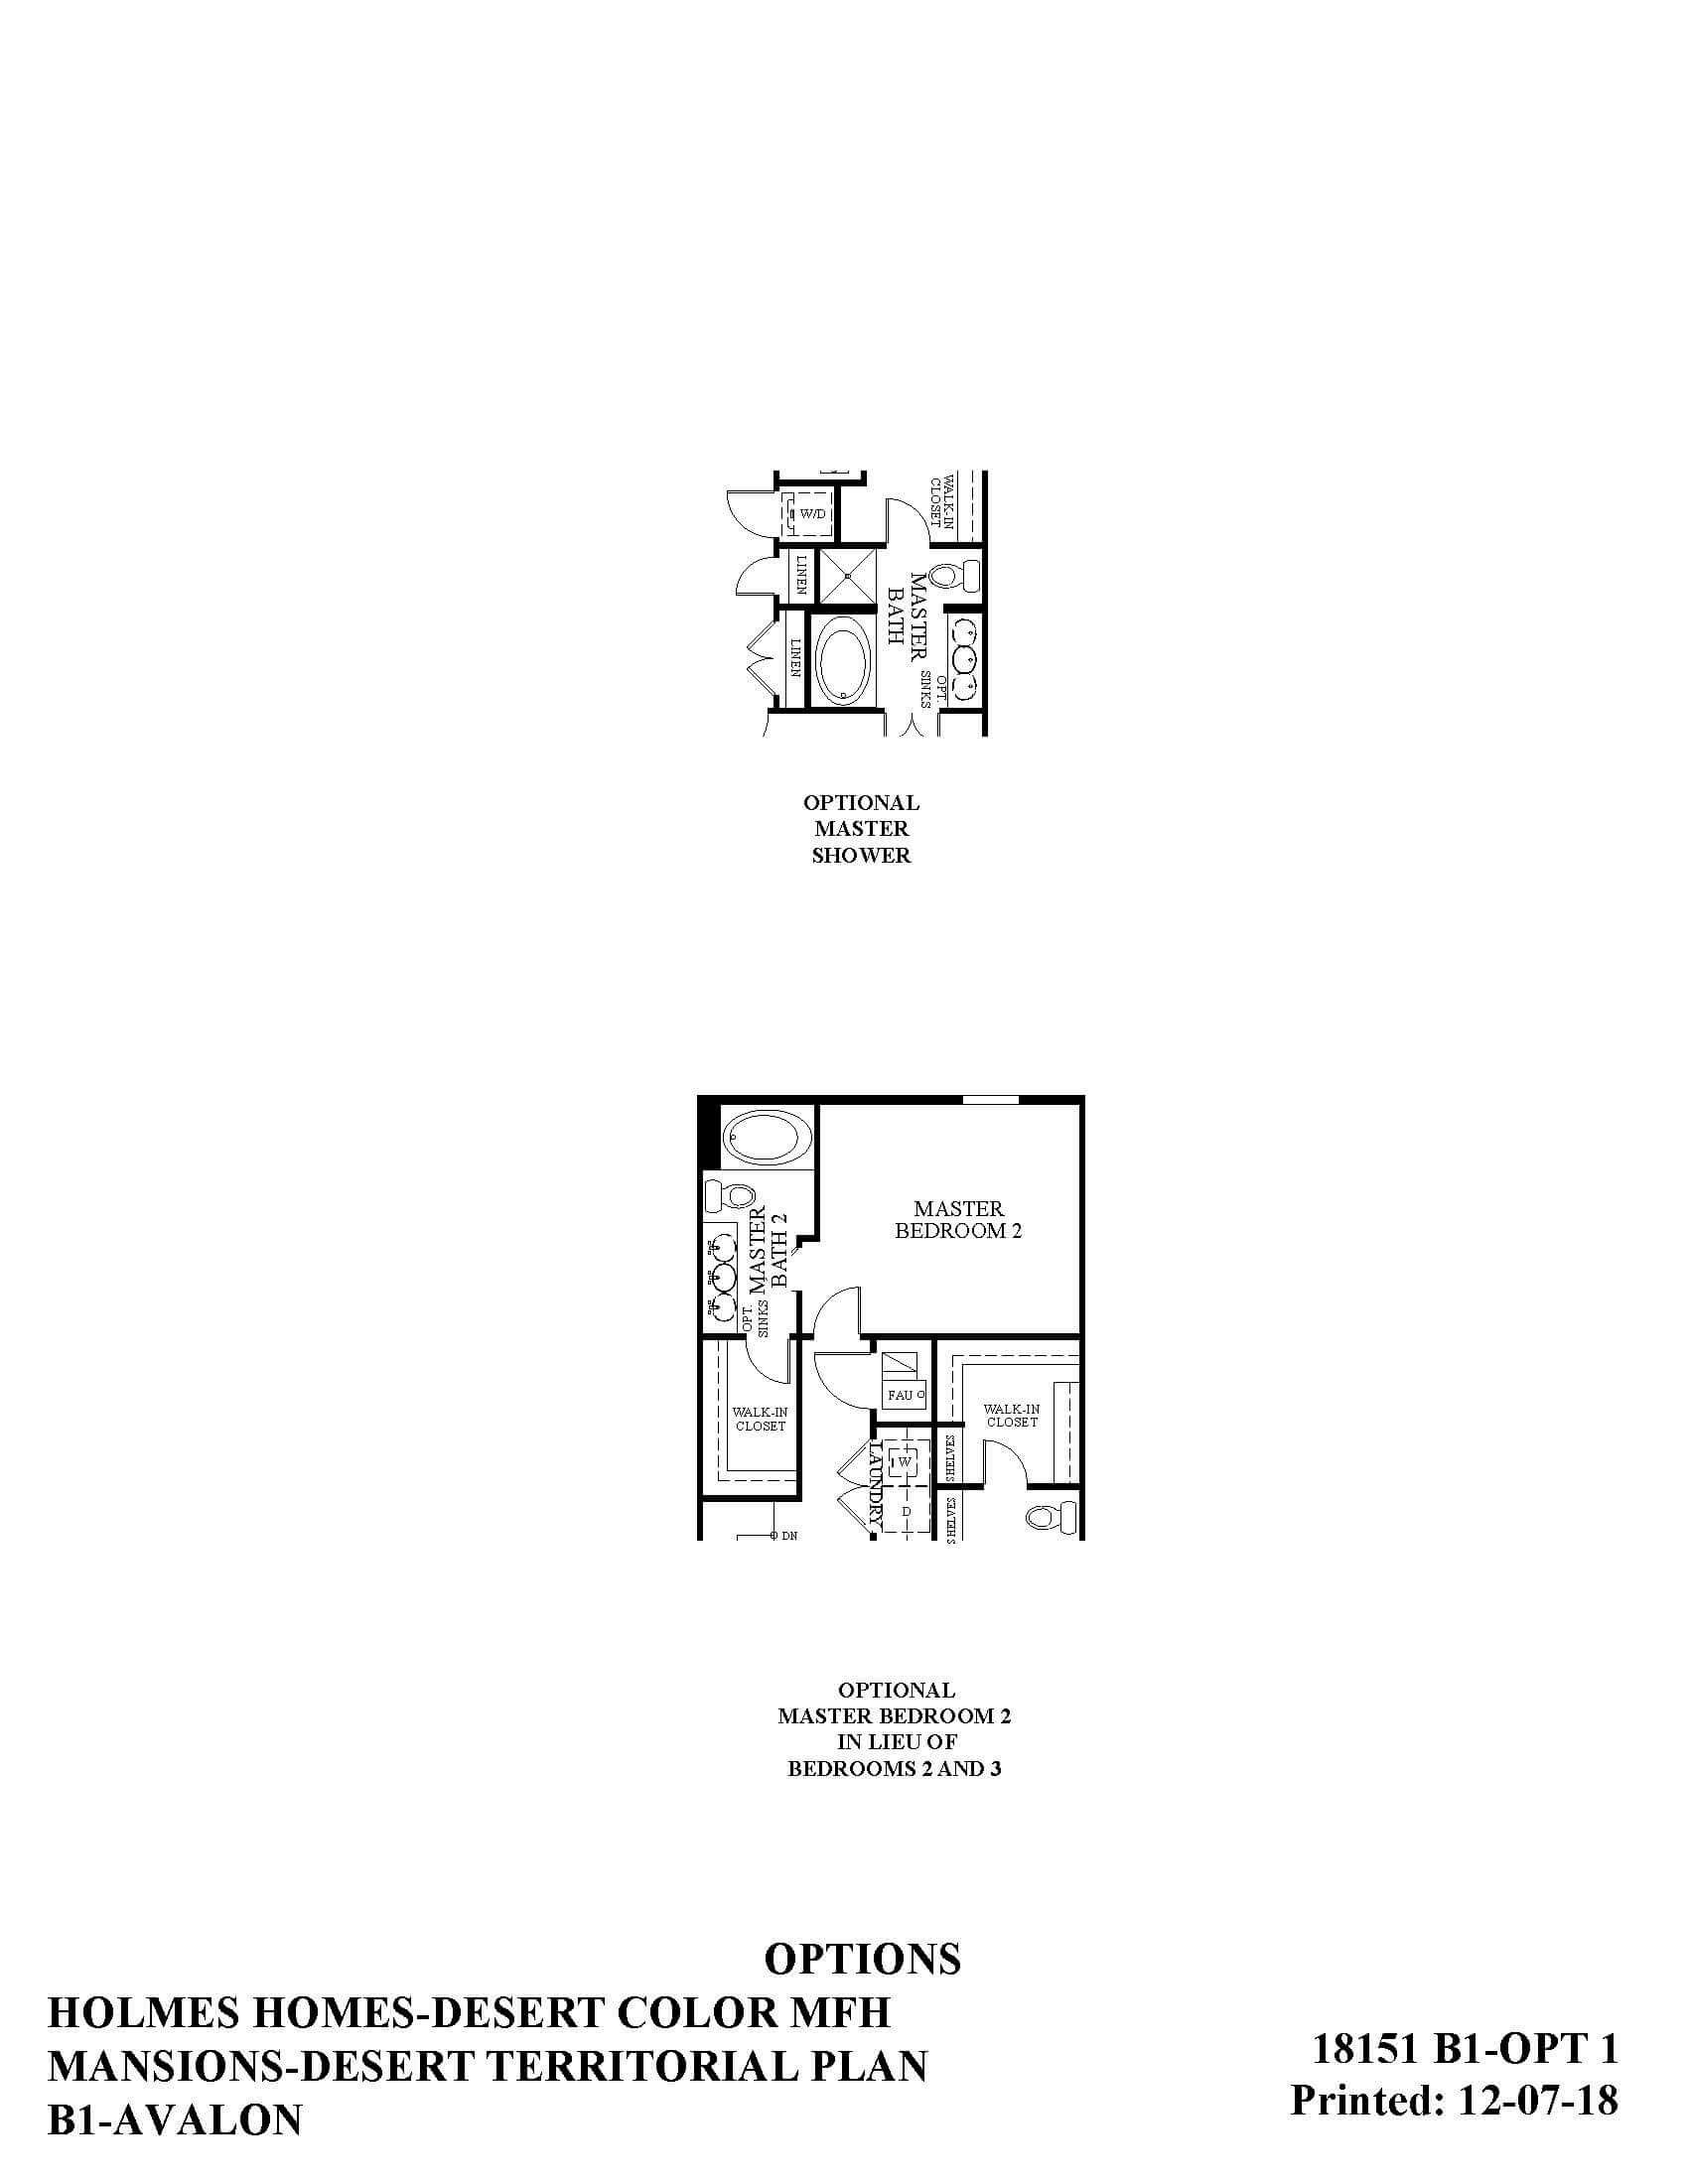 Desert Color Holmes Homes Mansions Avalon Options Floor Plan